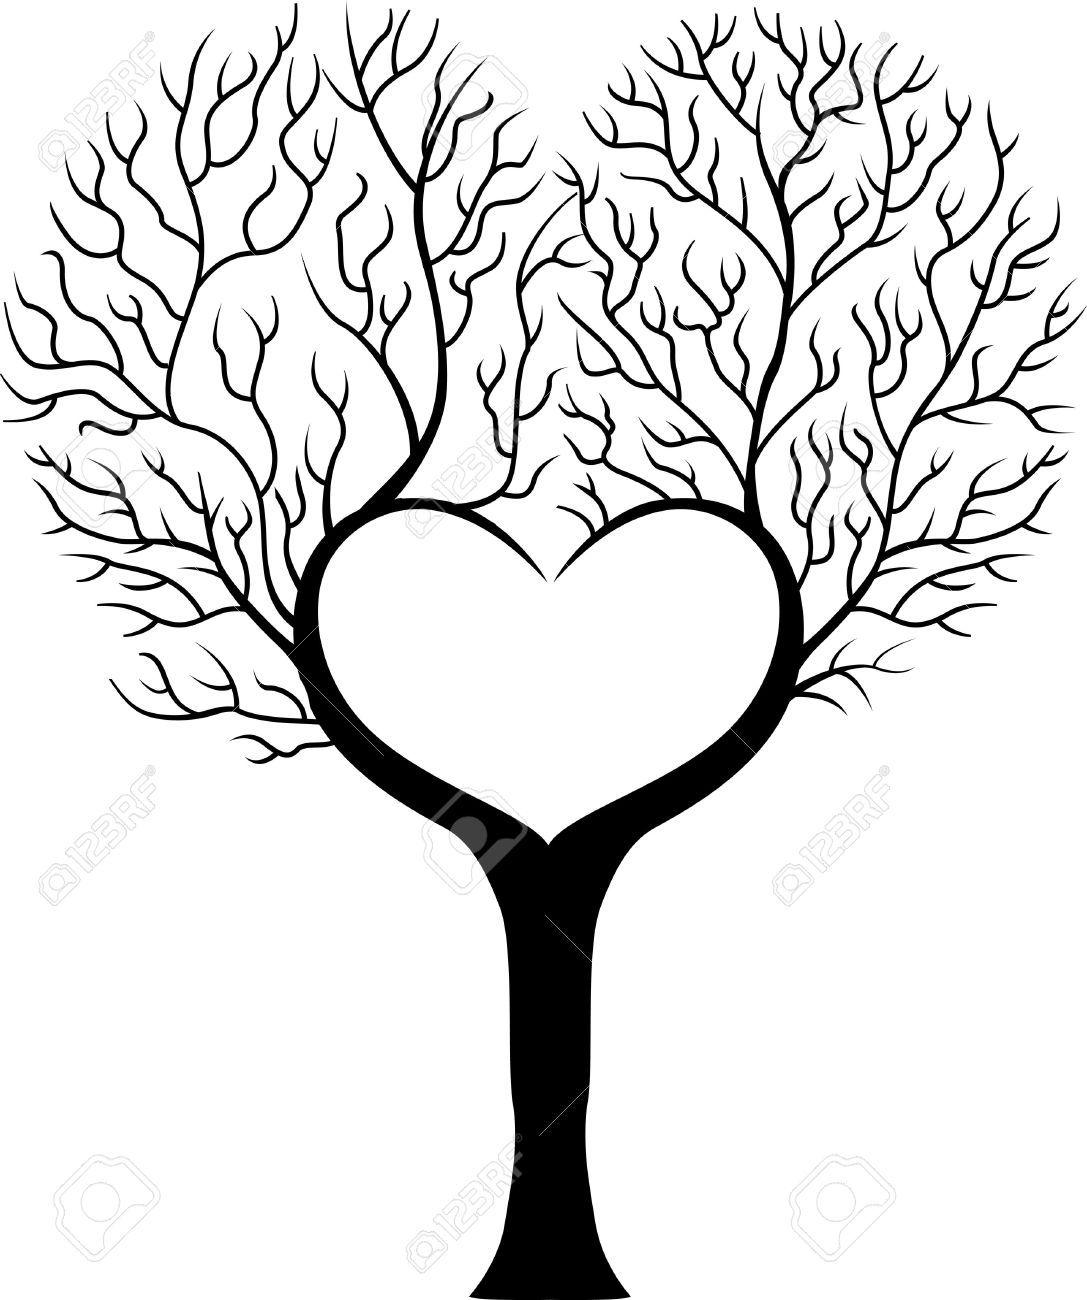 Tree Branch Cartoon In Shape Of Heart Cartoon Trees Tree Branches Vector Art Download tree cartoon branch stock vectors. cartoon trees tree branches vector art